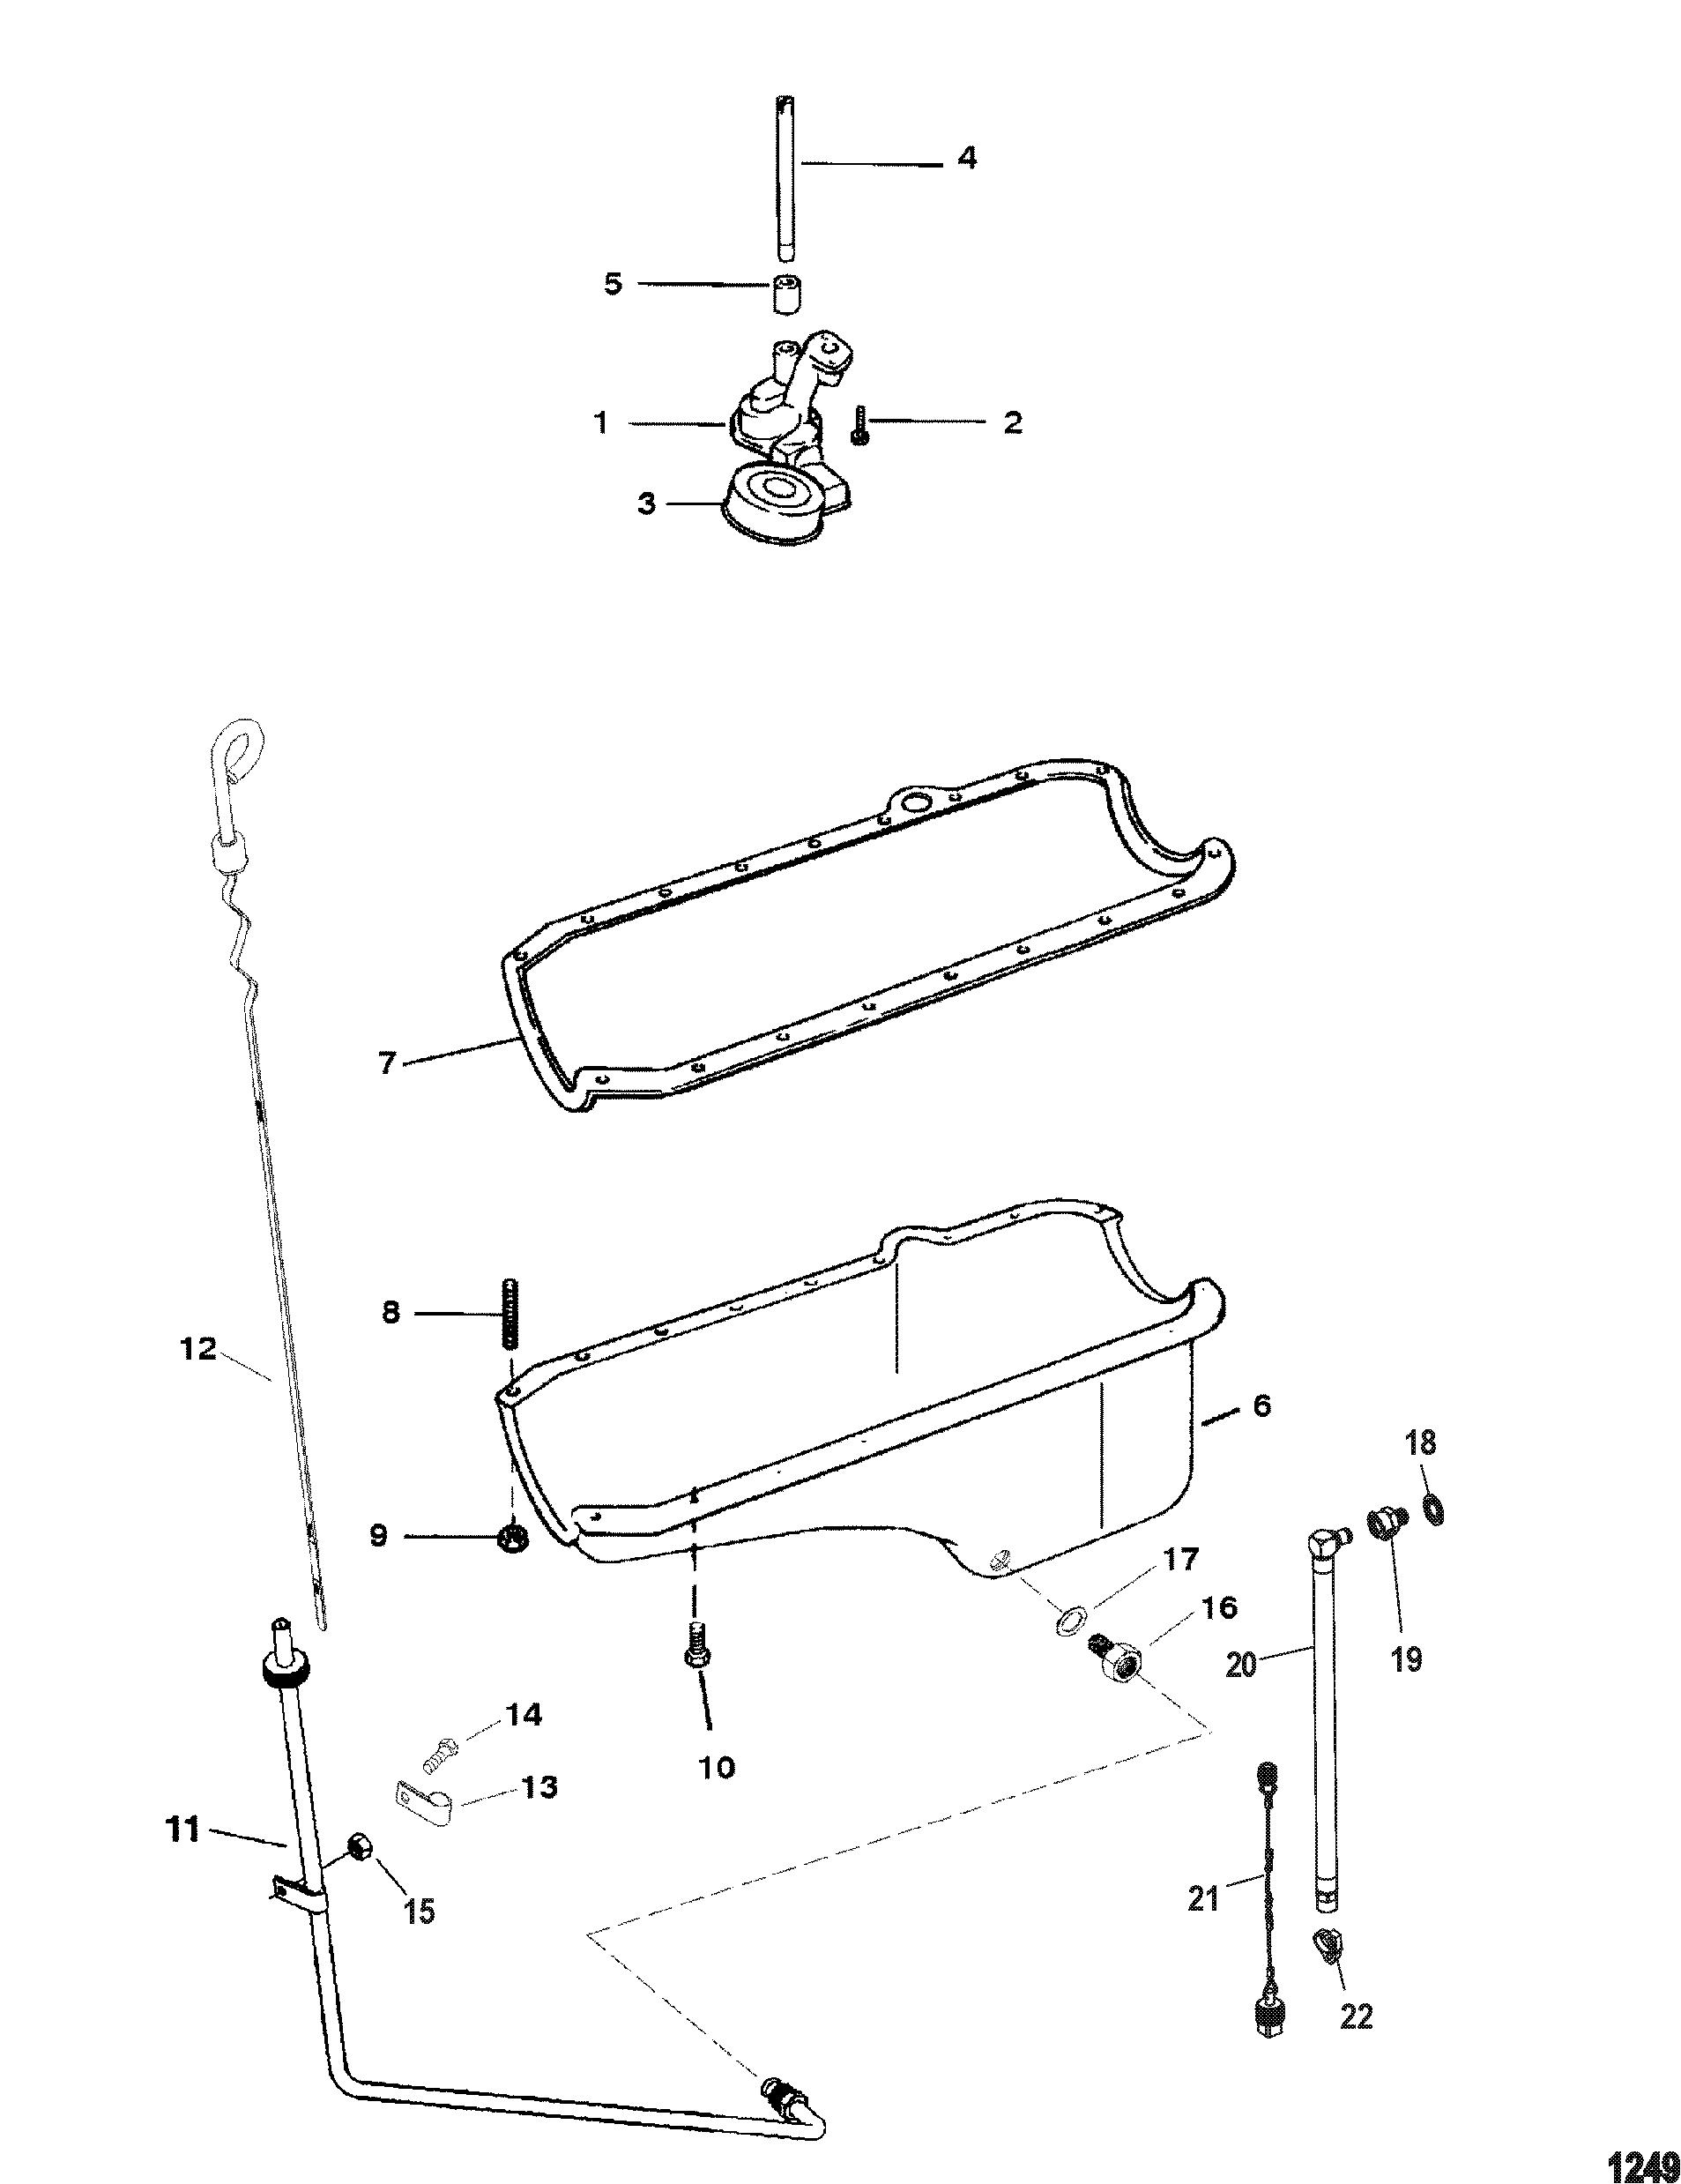 Oil Pan And Oil Pump For Mercruiser 4 3l Efi Alpha Bravo 262 C I D Gen